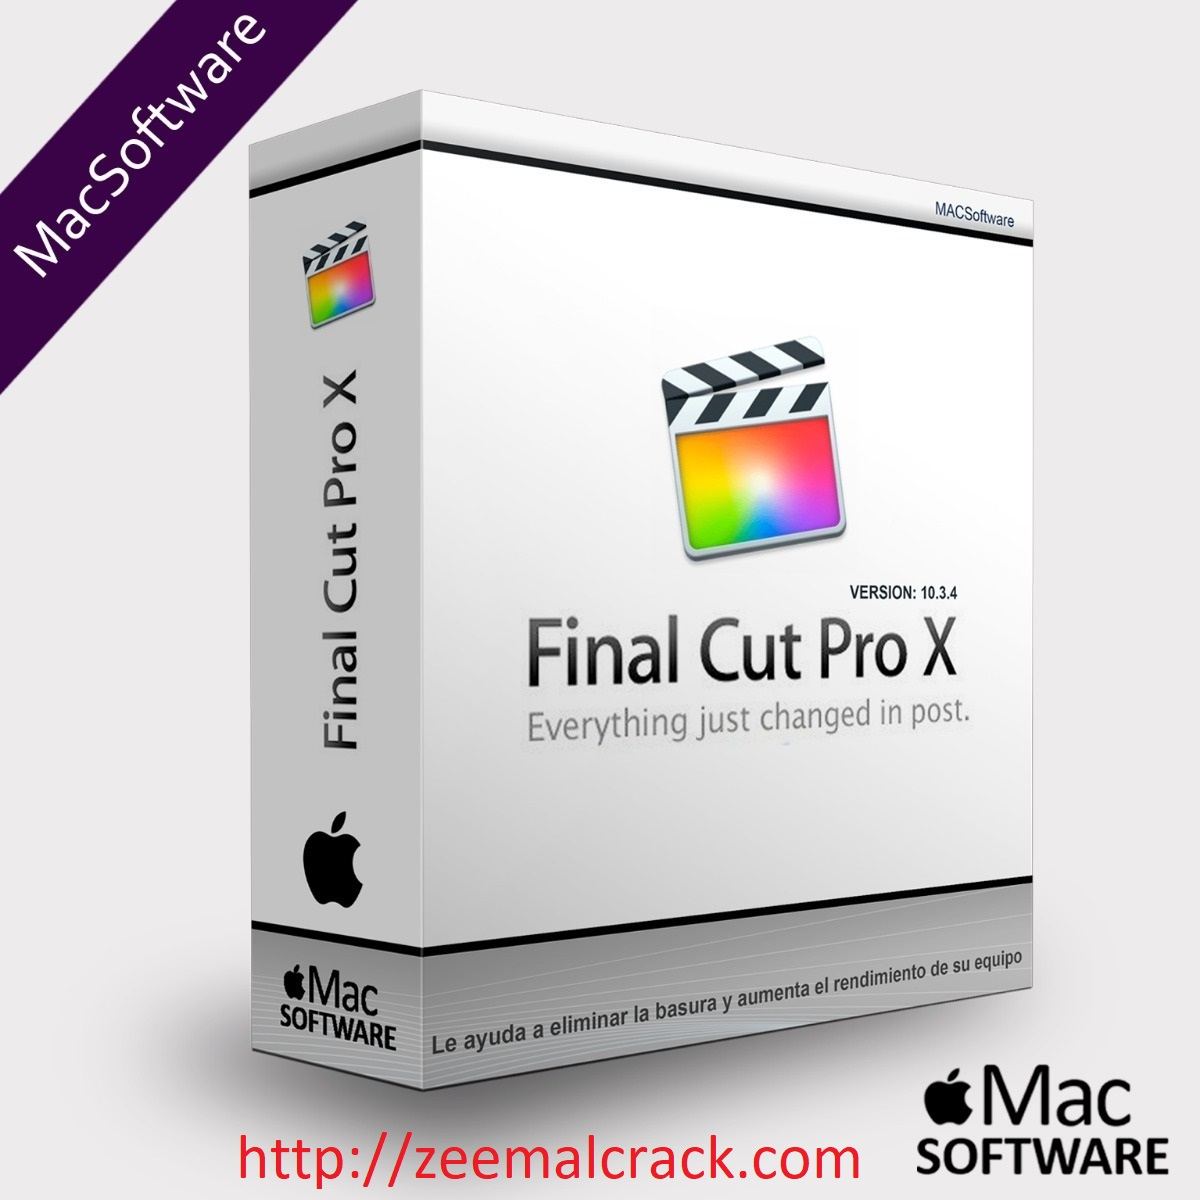 final cut pro x 10.4 download